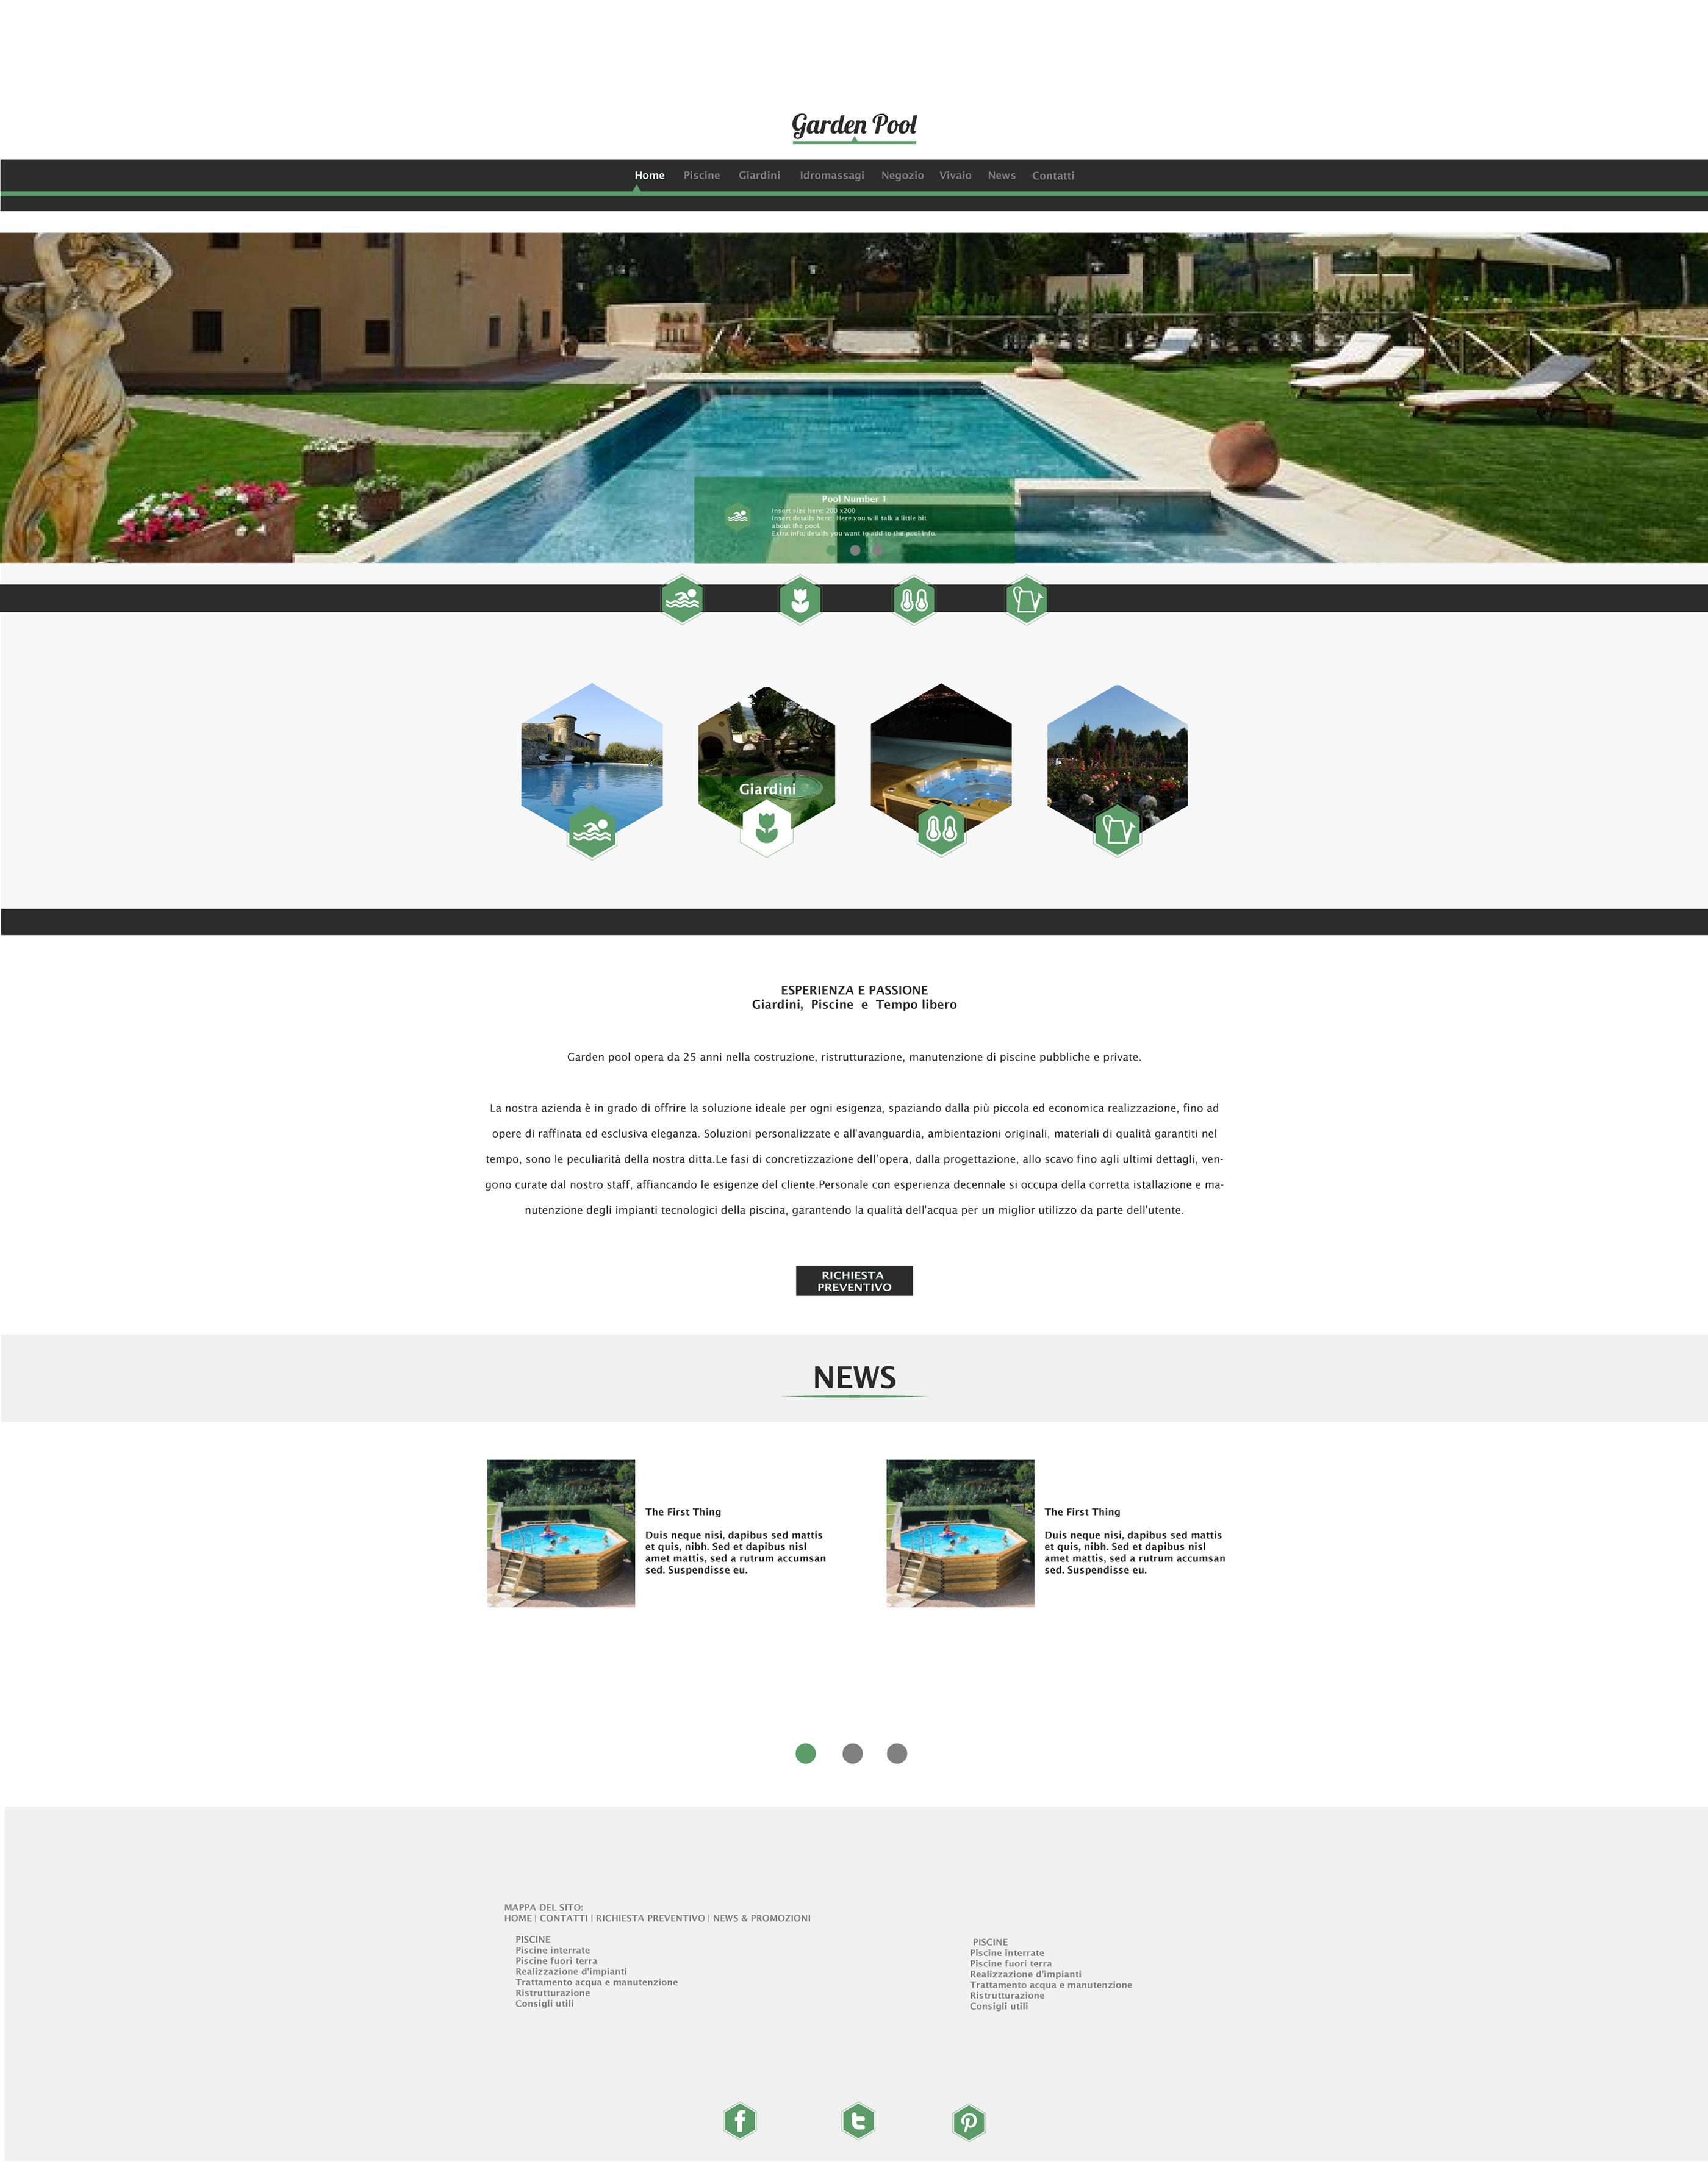 Foto Di Piscine Private garden pool website on behance